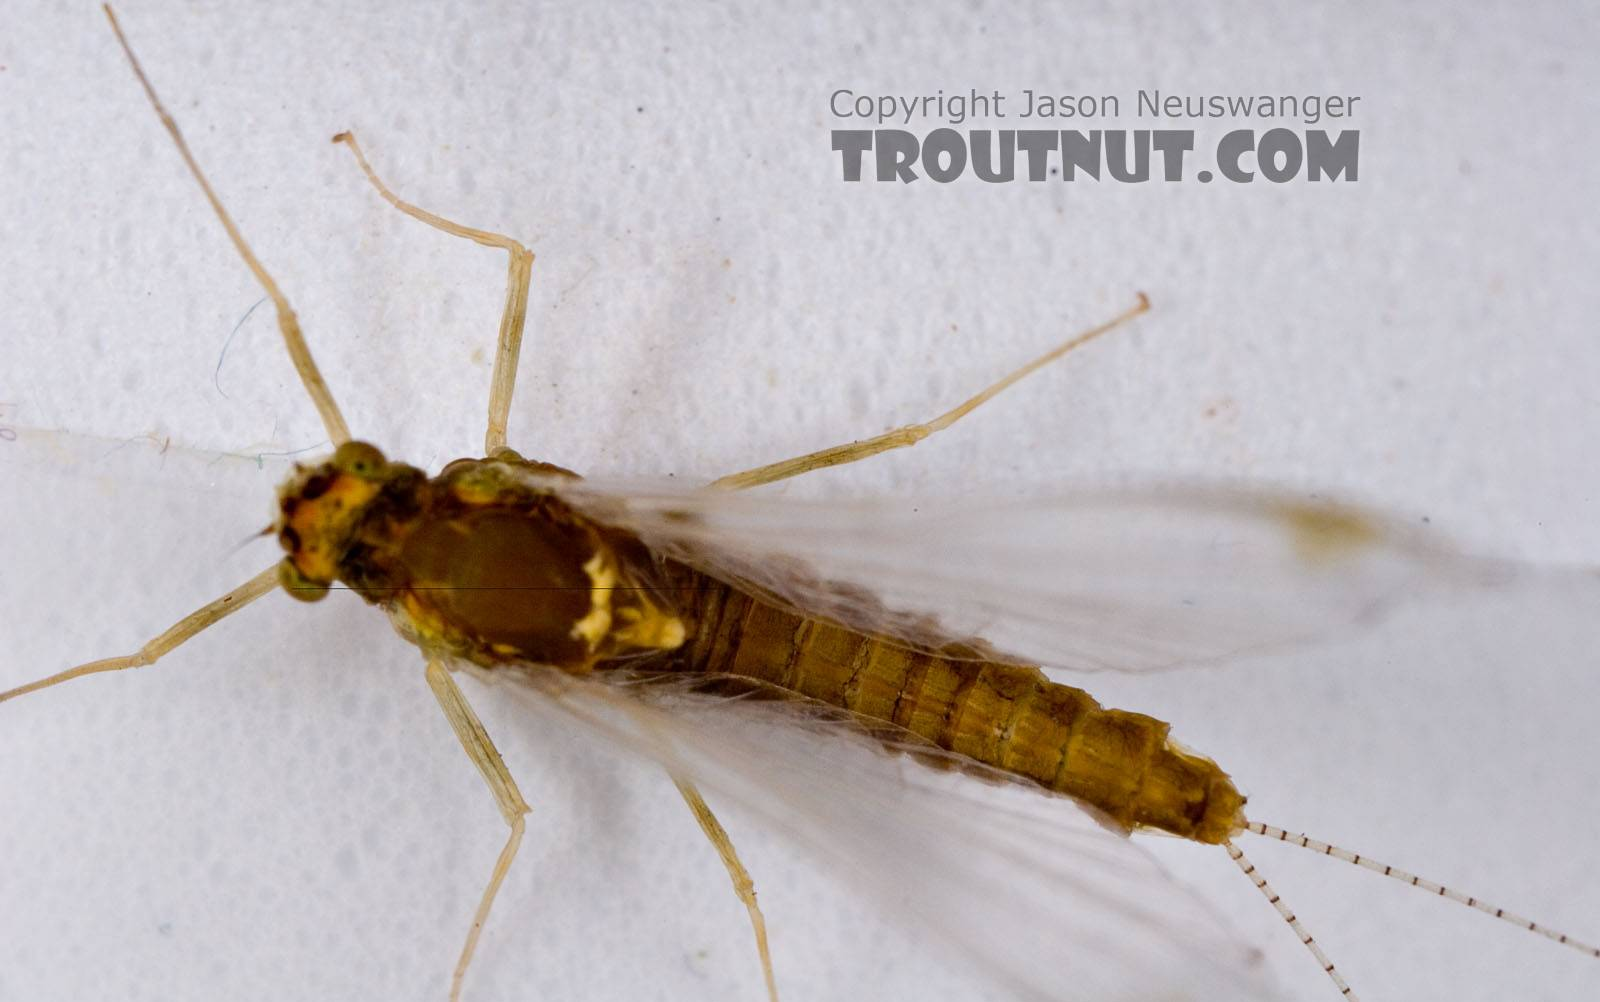 Female Ephemerella (Hendricksons, Sulphurs, PMDs) Mayfly Spinner from Mystery Creek #42 in Pennsylvania